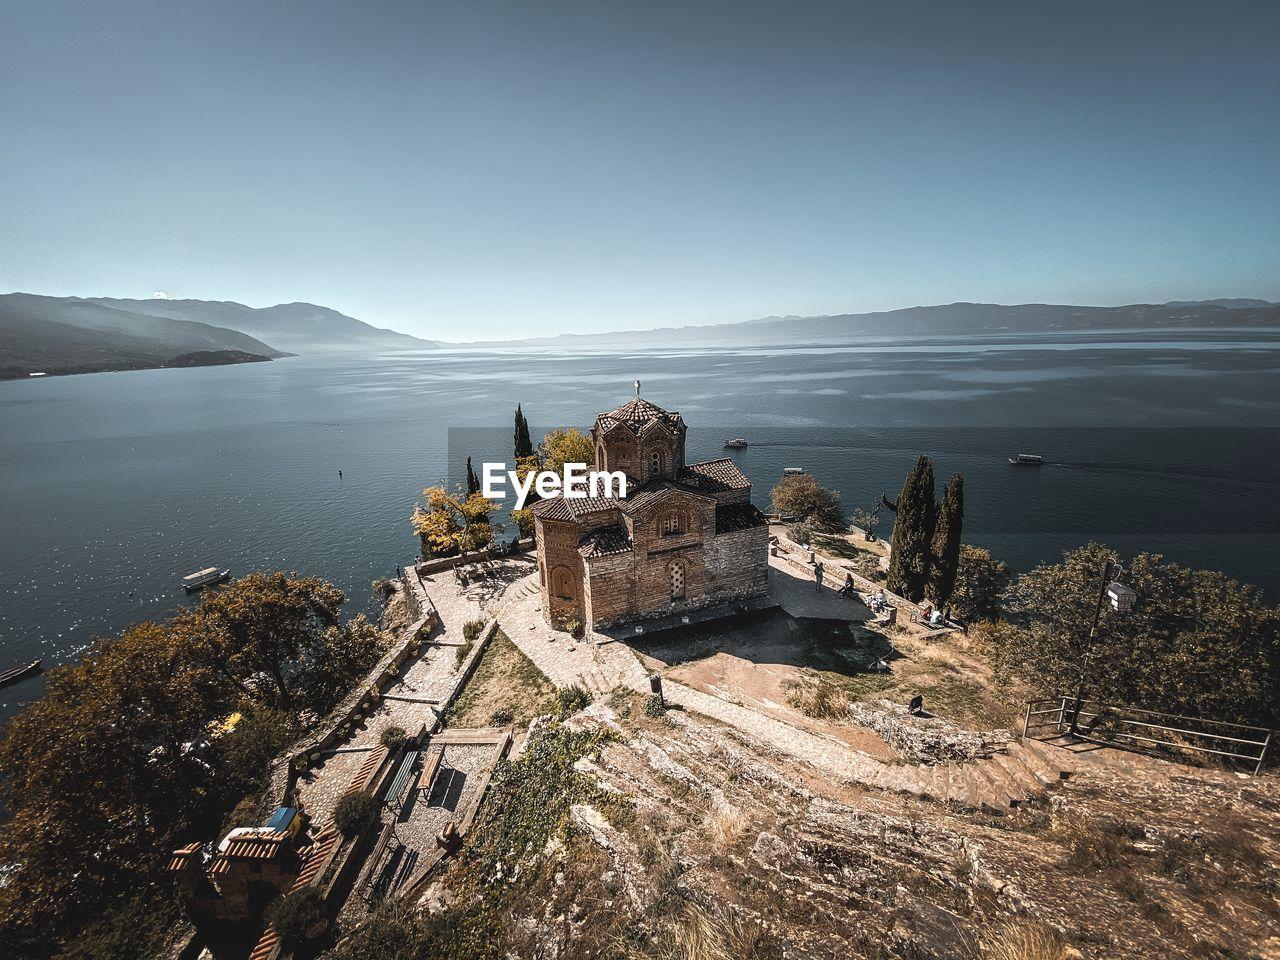 Lake ohrid kaneo church